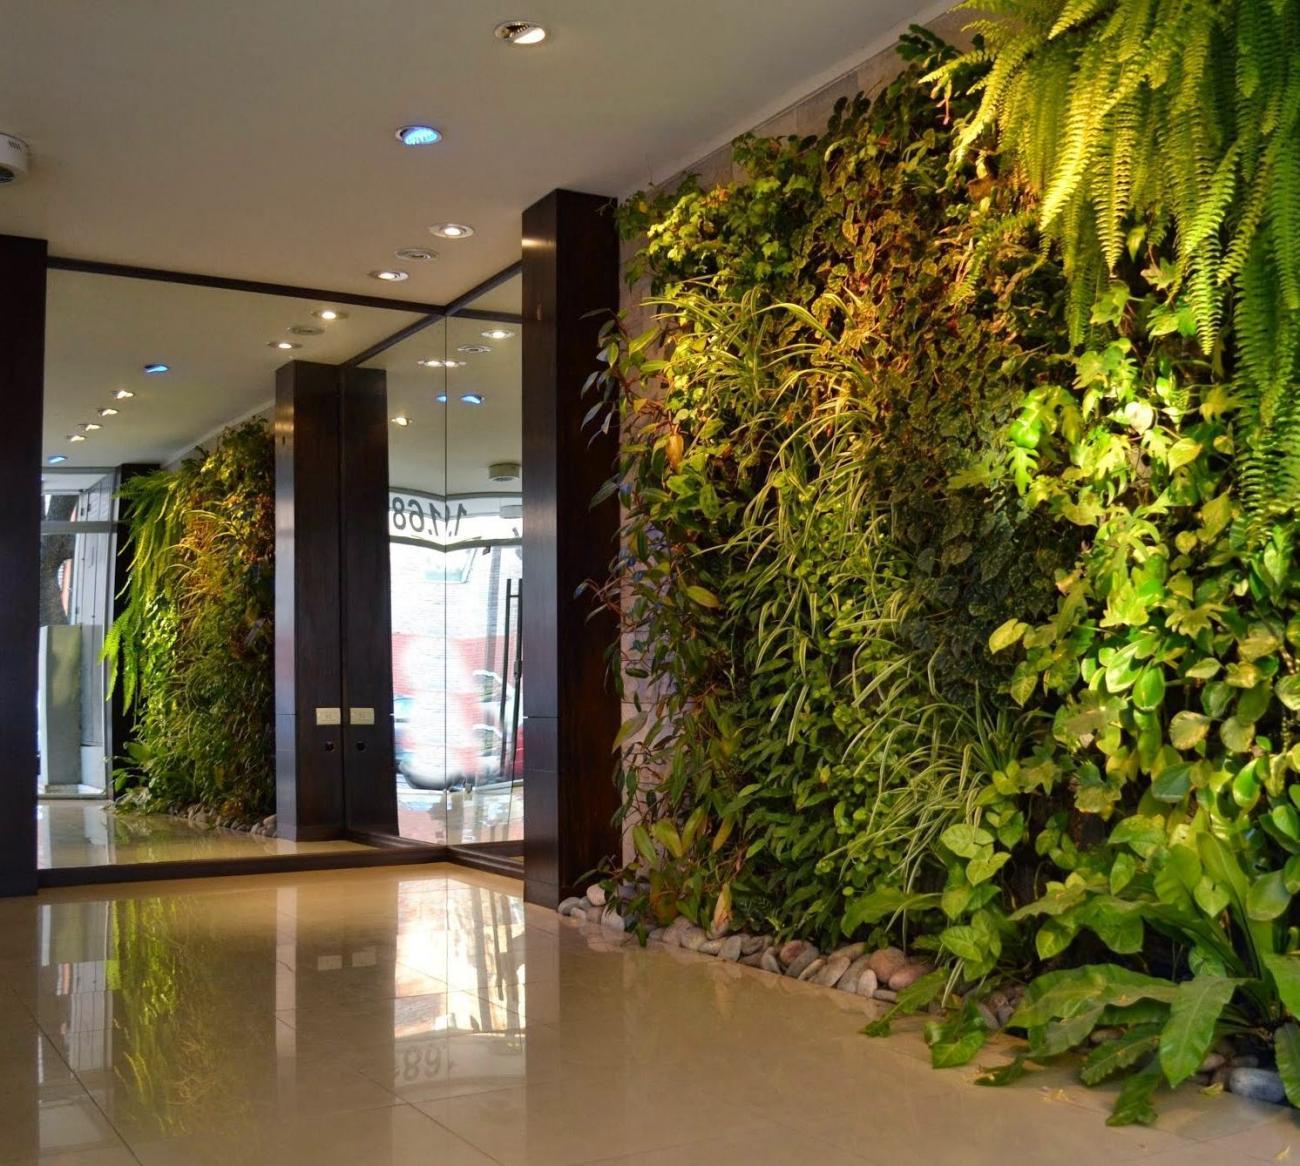 Jard n vertical en buenos aires roosevelt belgrano - Jardines verticales plantas ...